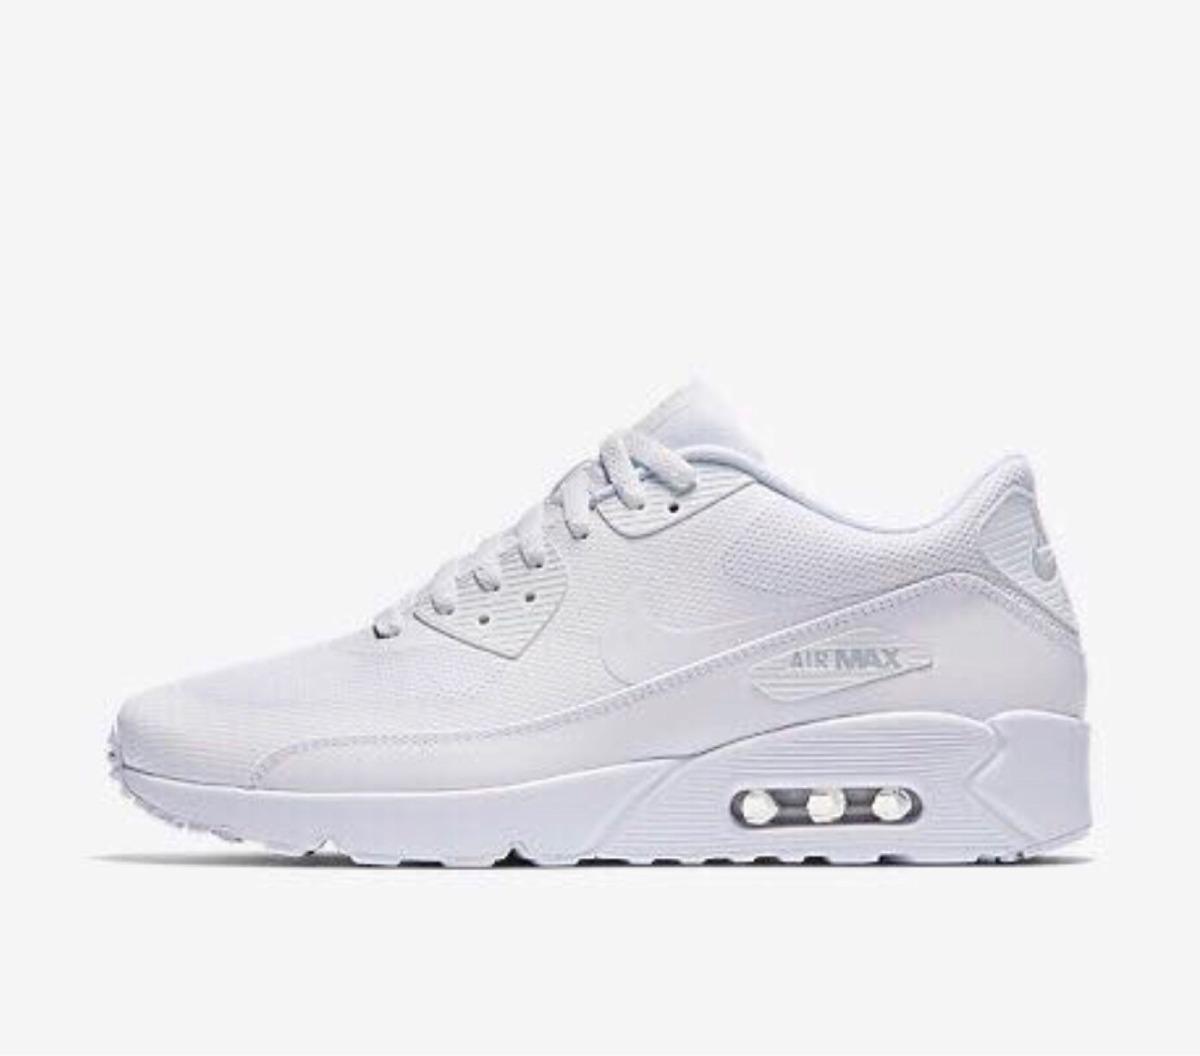 best website 399ff 22f7d Tenis Nike Air Max 90 Essential 2.0 White Con Caja -  1,695.